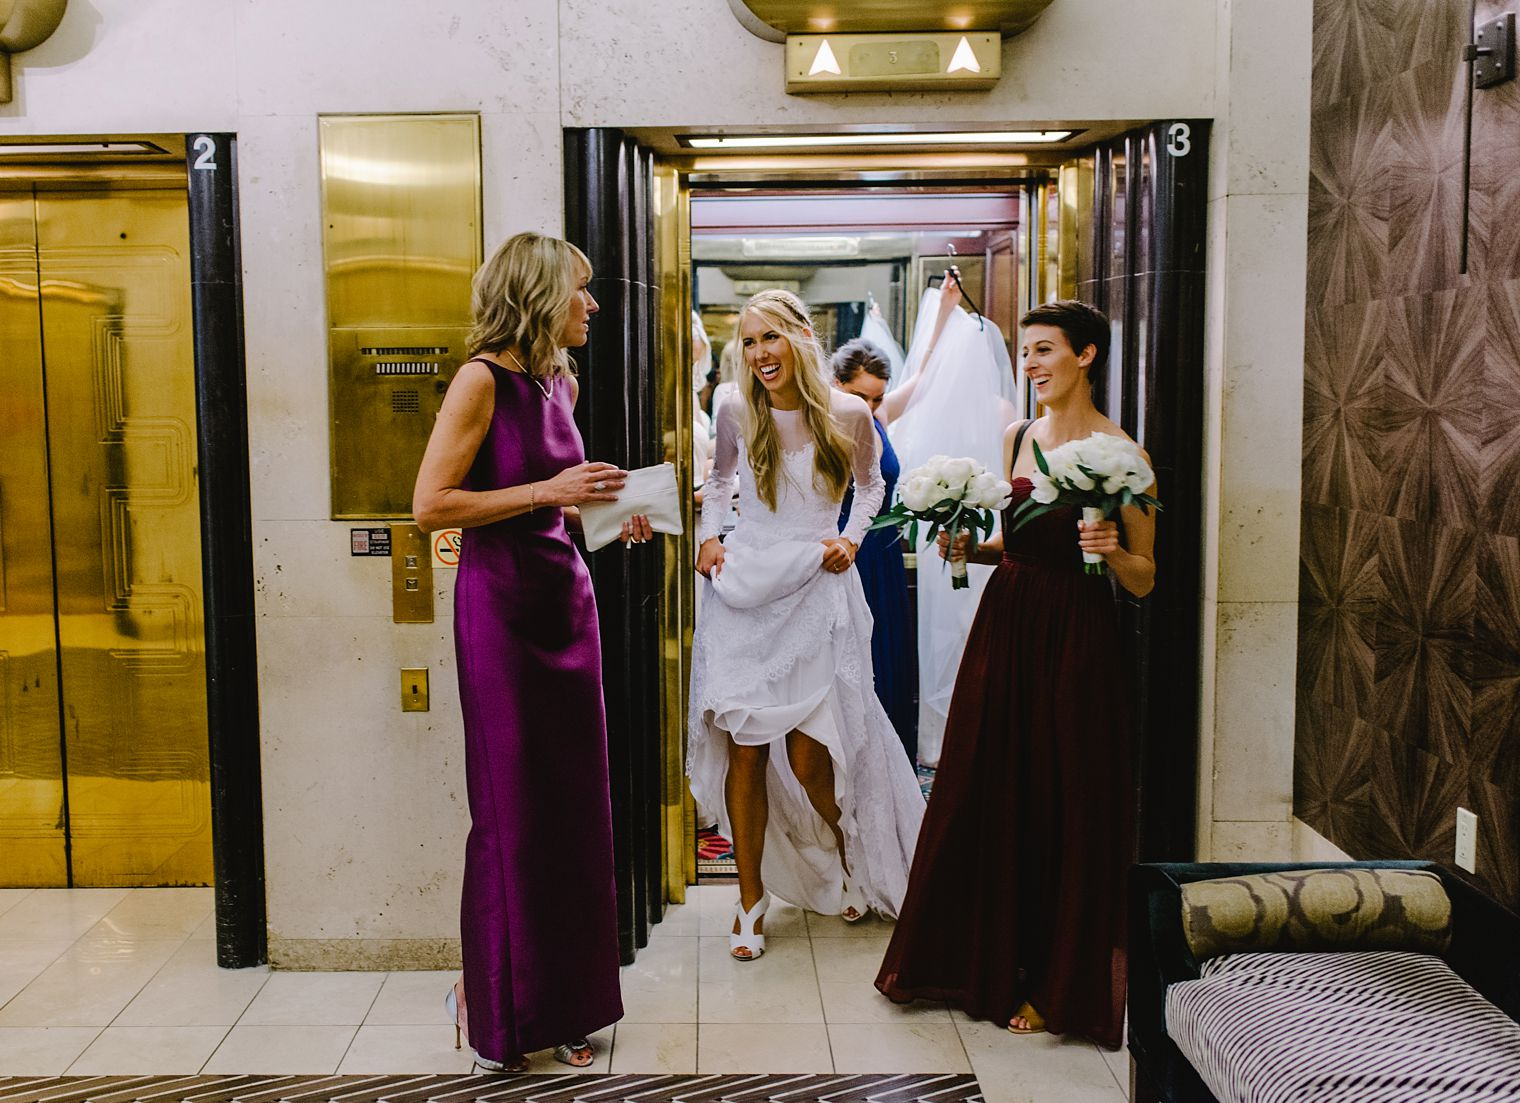 fairmont vancouver hotel wedding